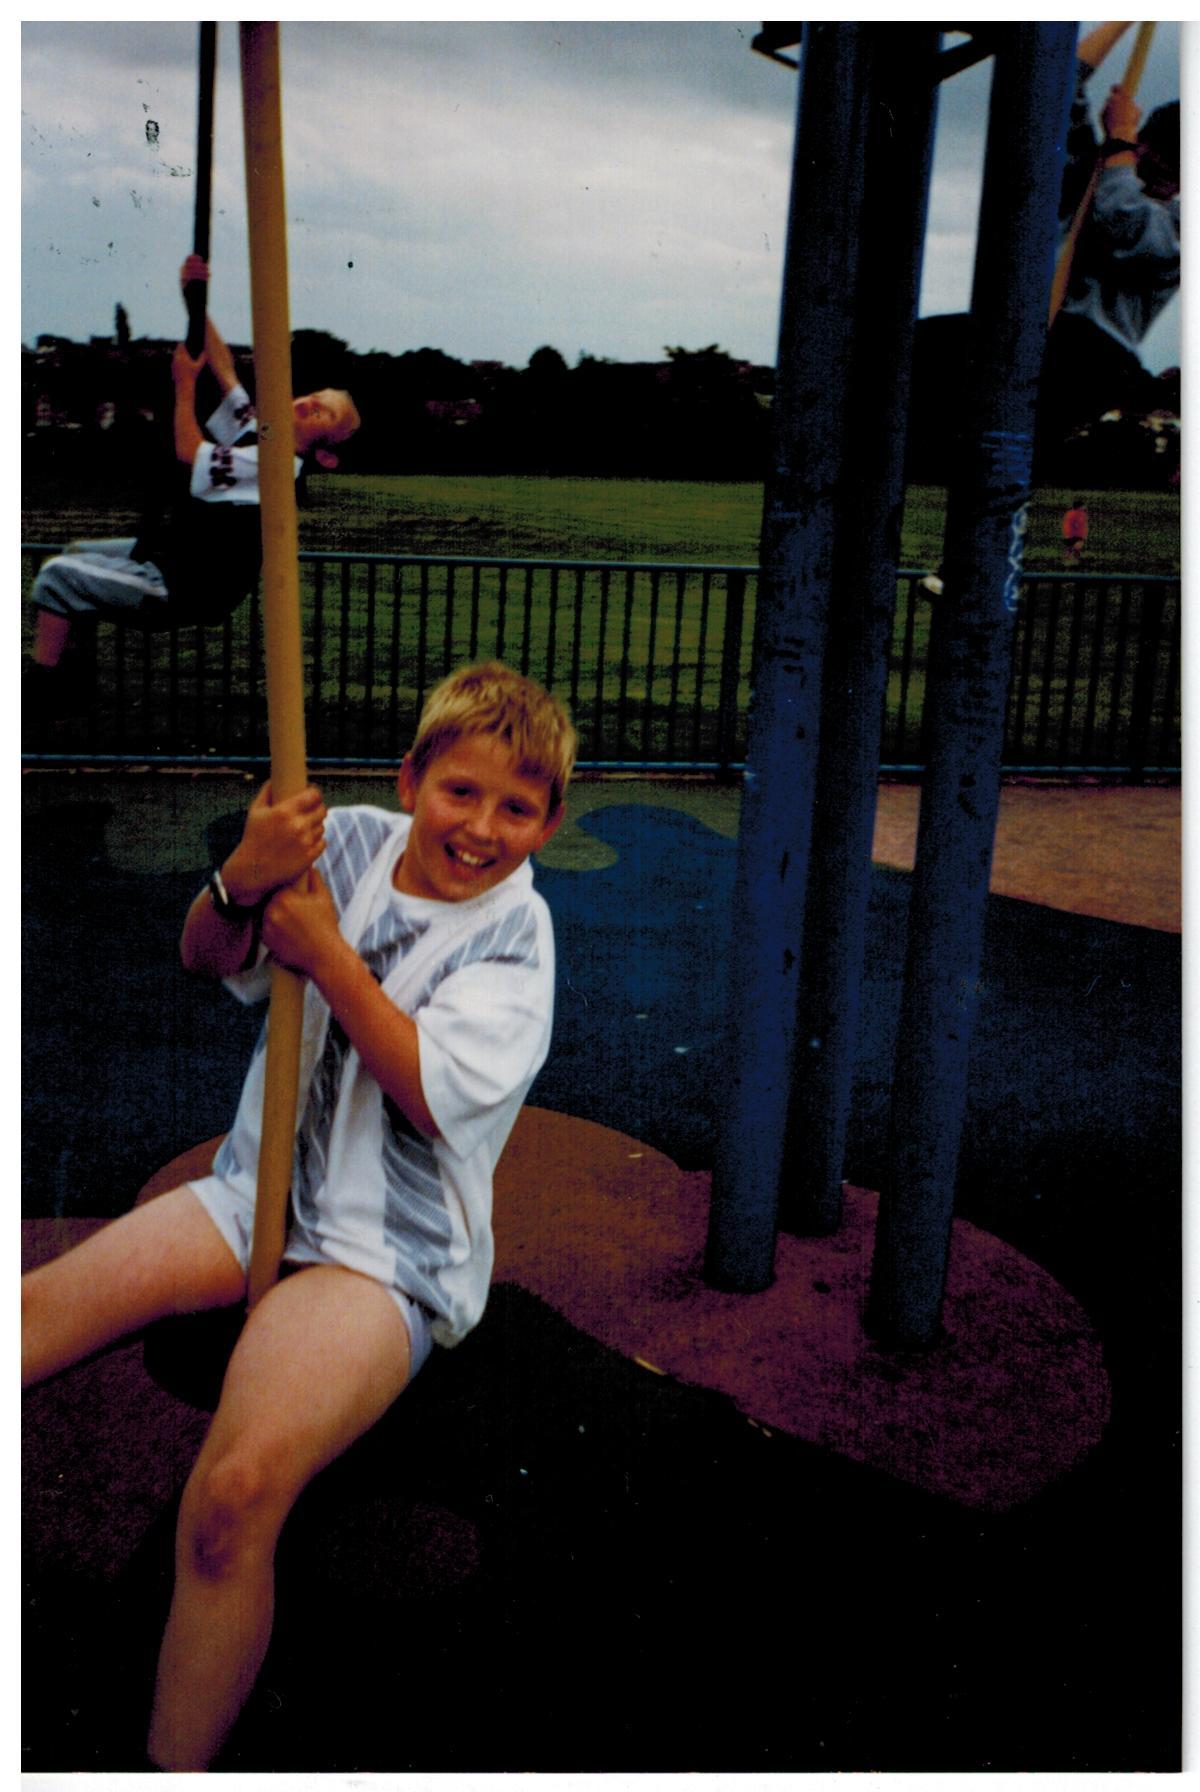 N112_Rounders_Homer-Hill_[15-07-1998]